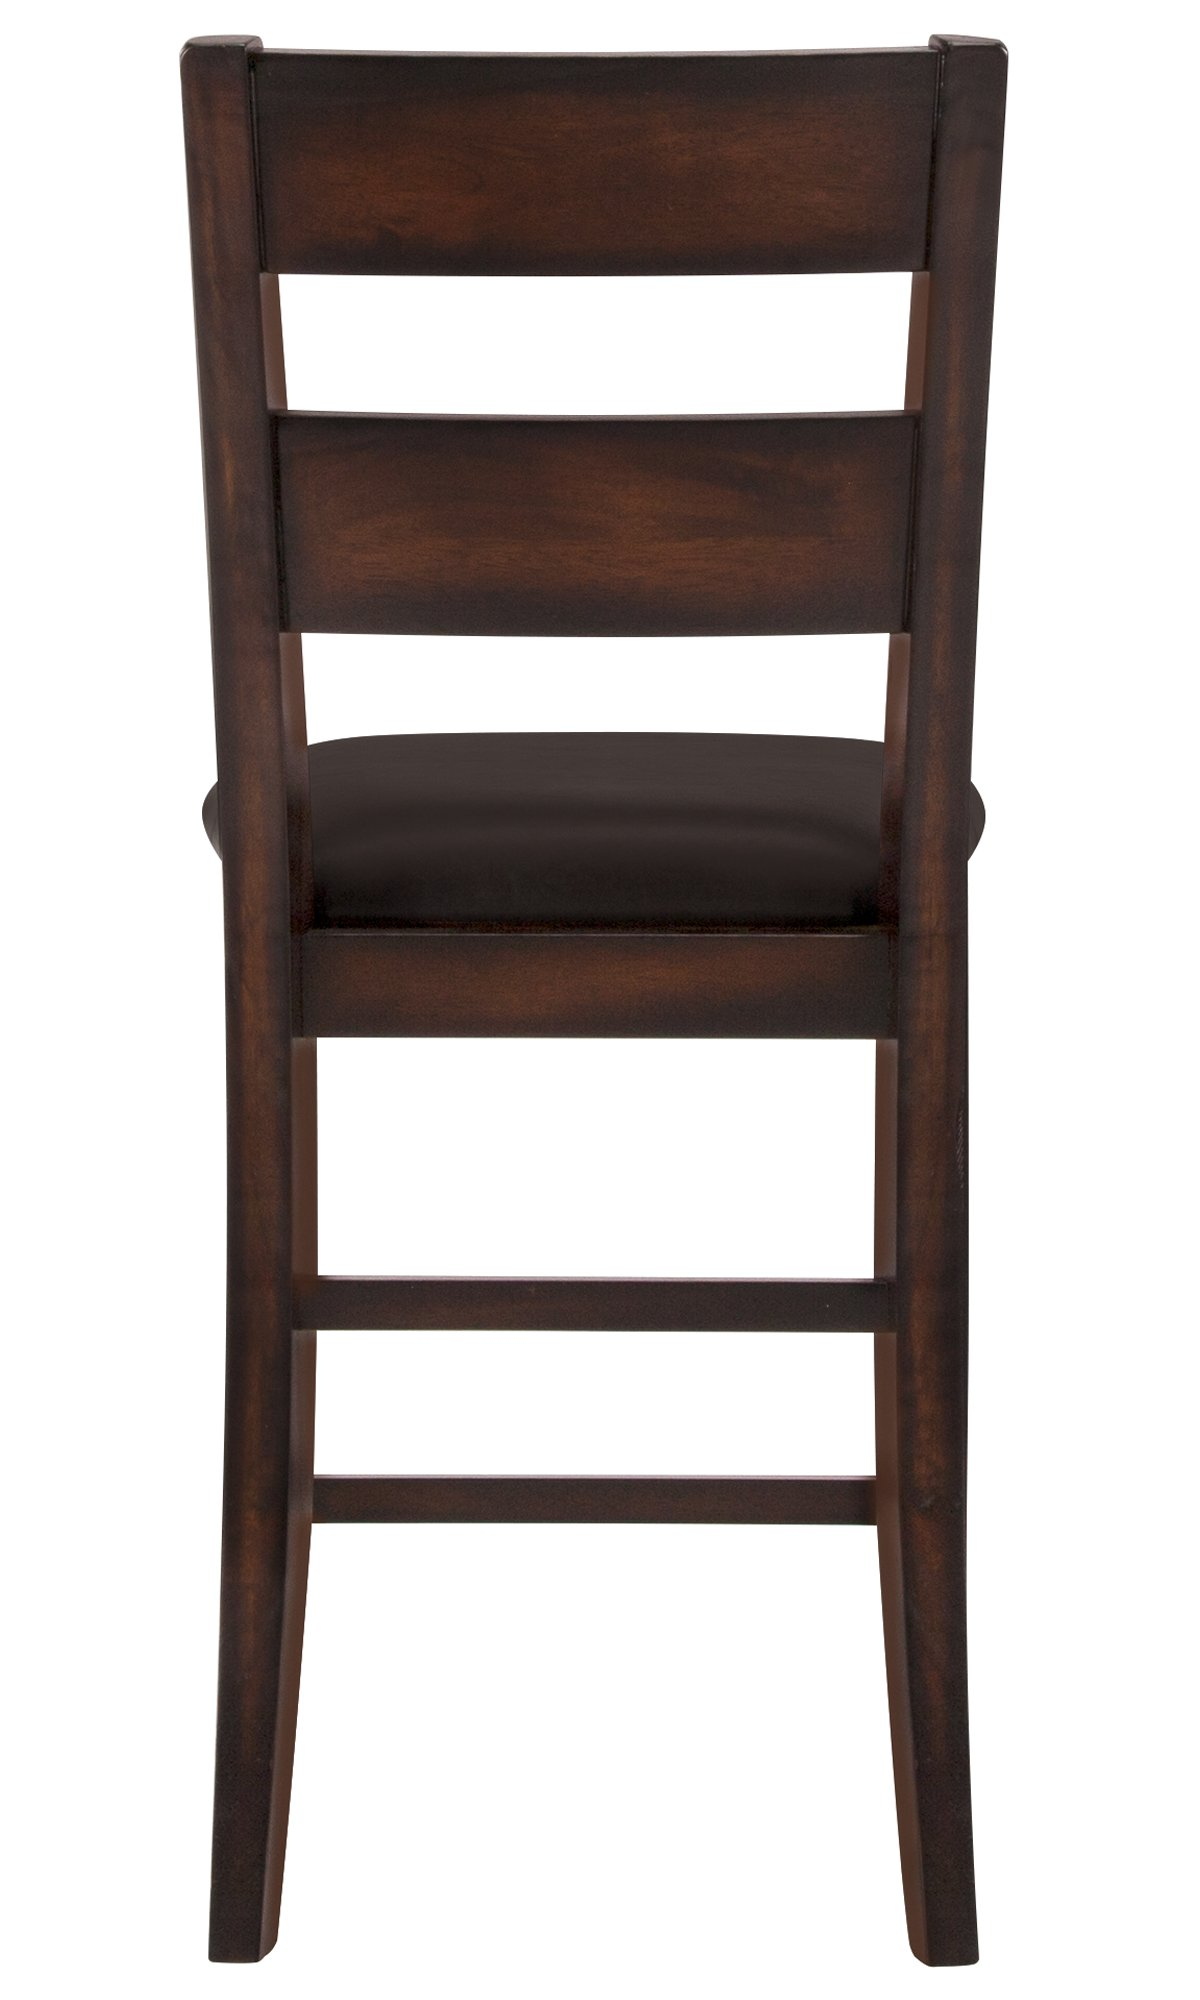 City Furniture: Mango2 Dark Tone High Table, 4 Barstools